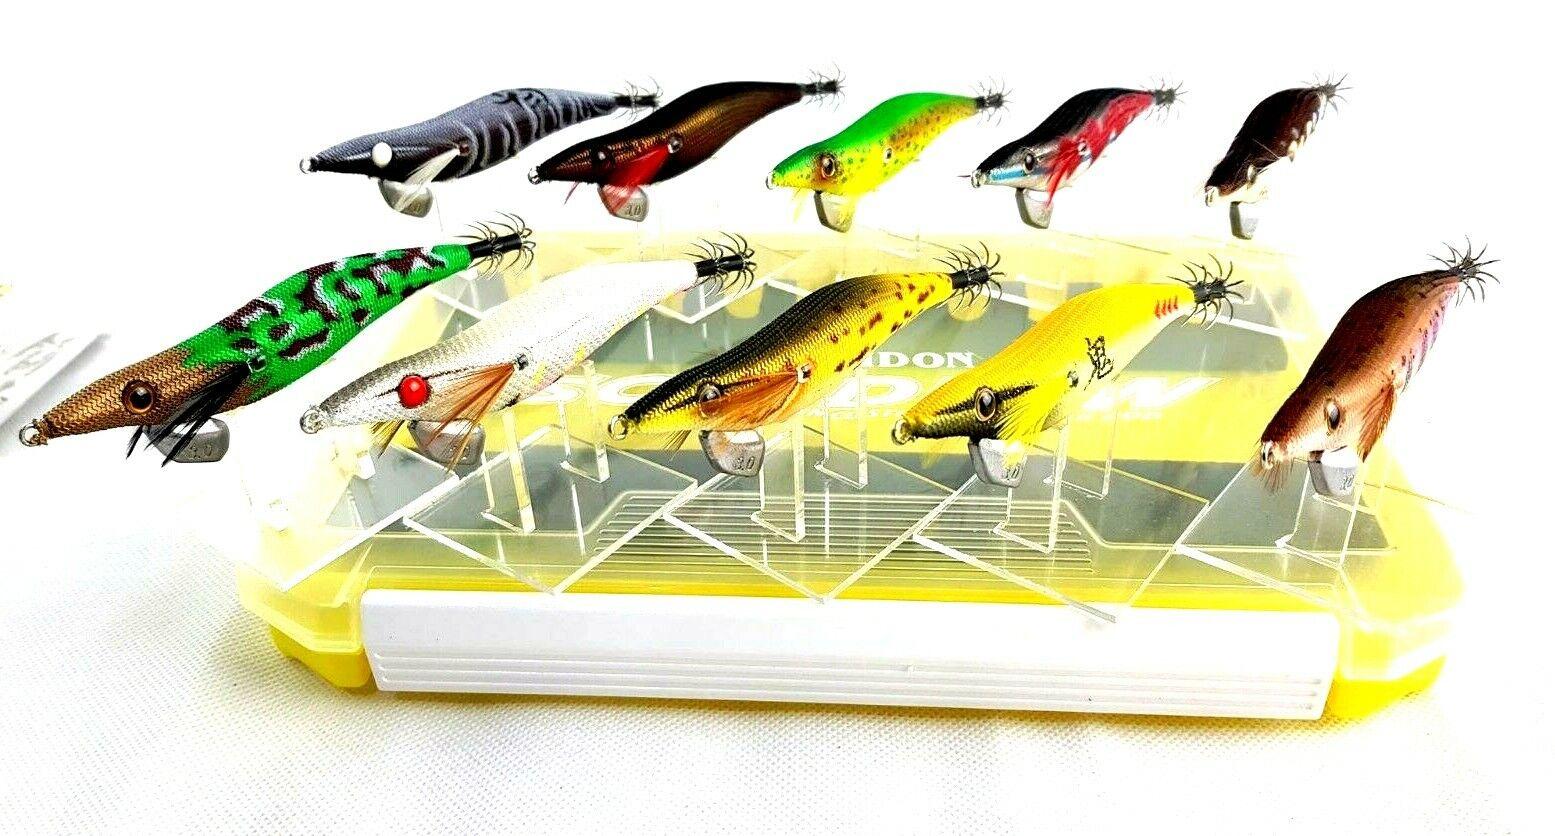 Gan Craft Egi kit  egi-jya 3.0 x 10  squid jigs  w evergreen egi box as pictured  excellent prices